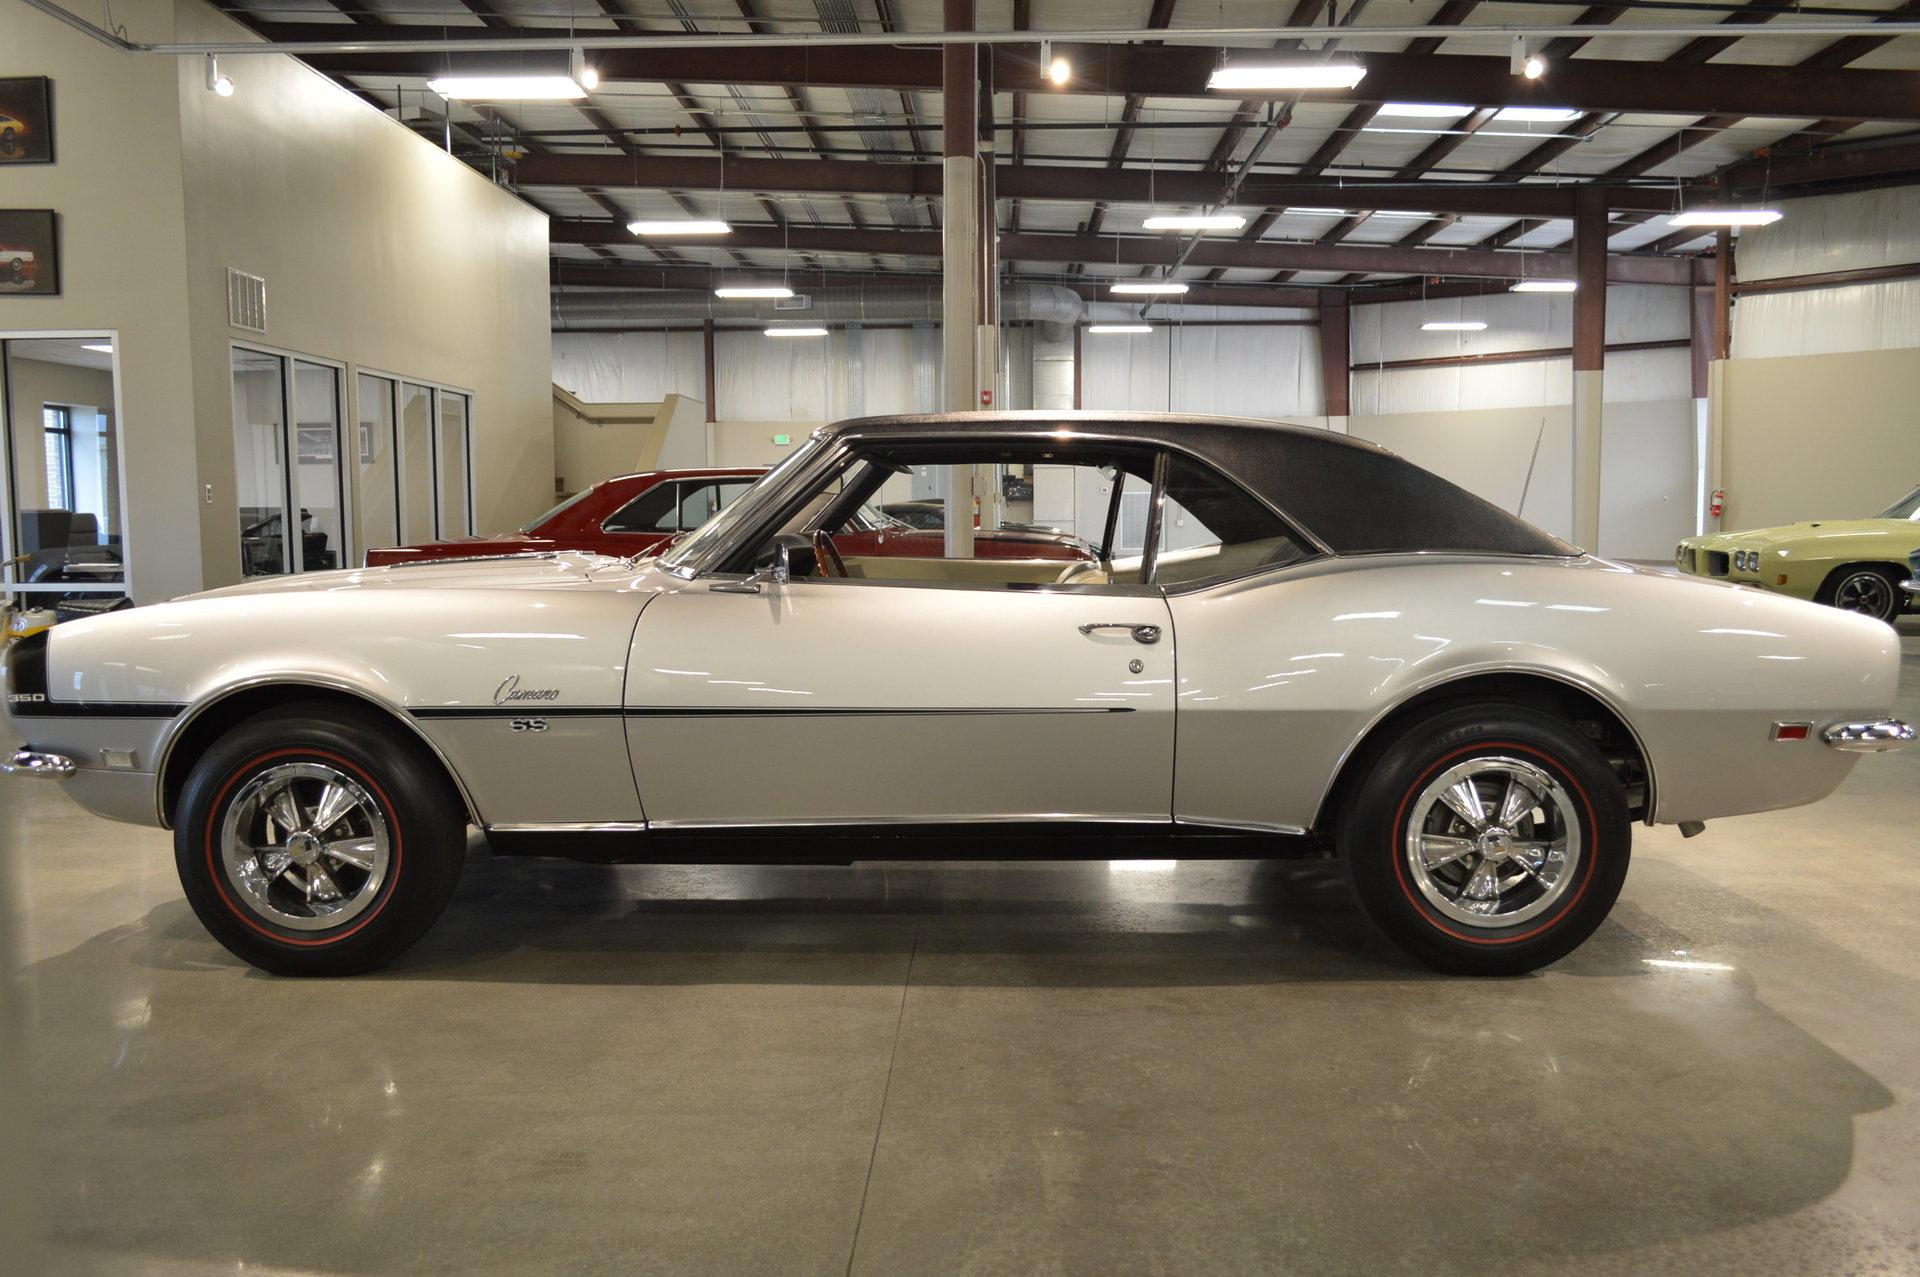 1968 Chevrolet Camaro Leaded Gas Classics Rs Black 156983c43d8f Thumb Dana